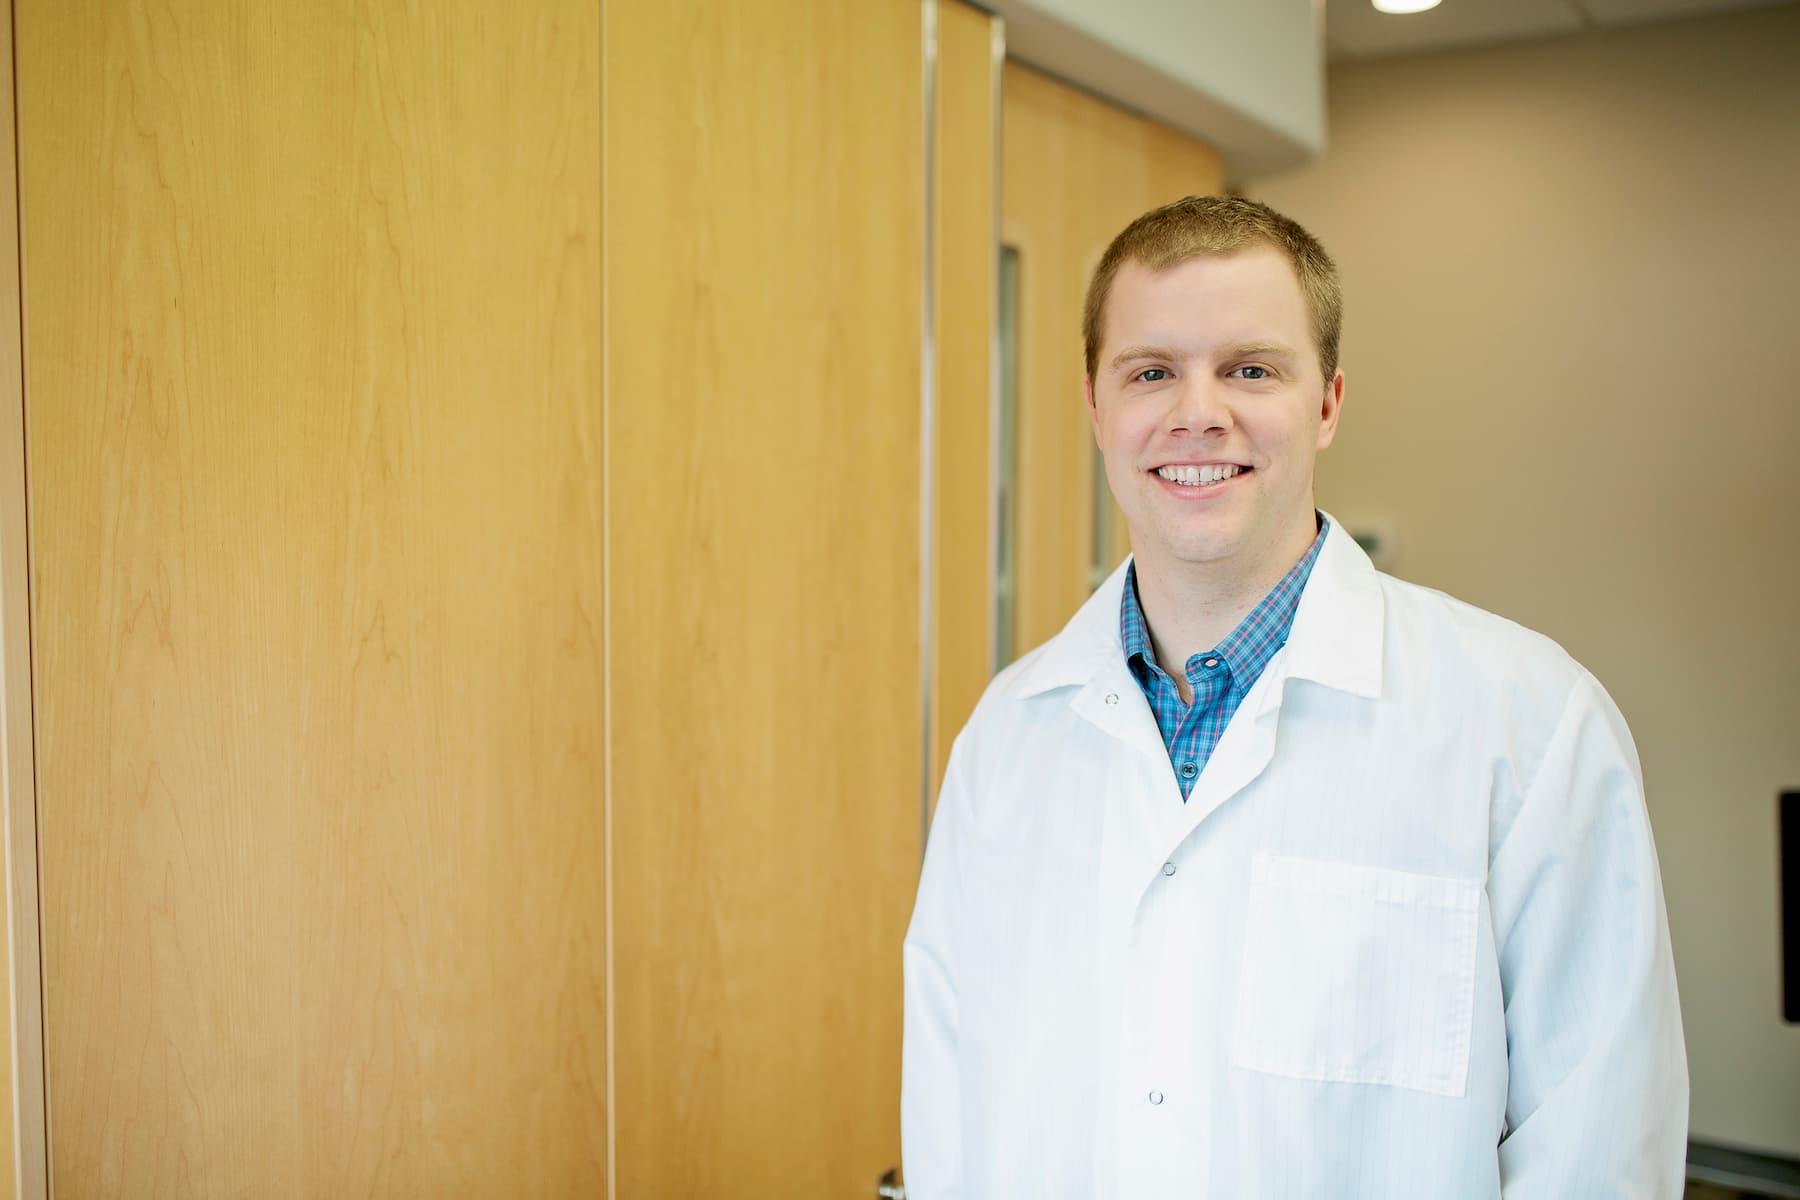 Dr. Bryce Plancich